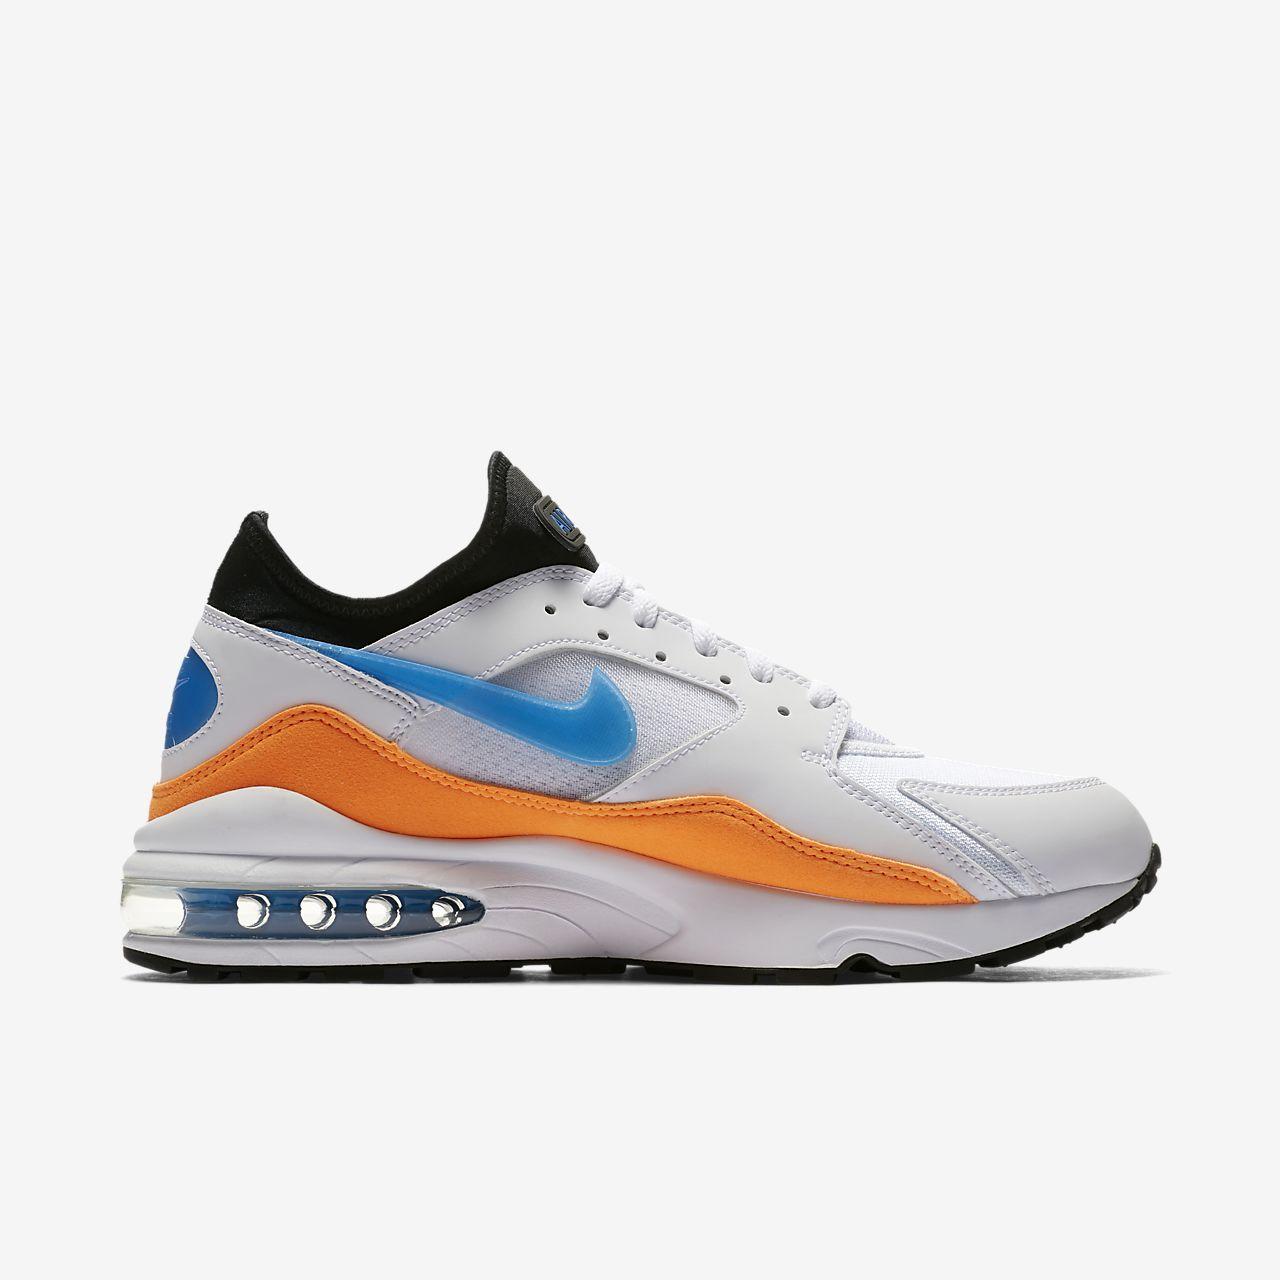 41d1bbe46d Nike Air Max 93 Men s Shoe. Nike.com GB